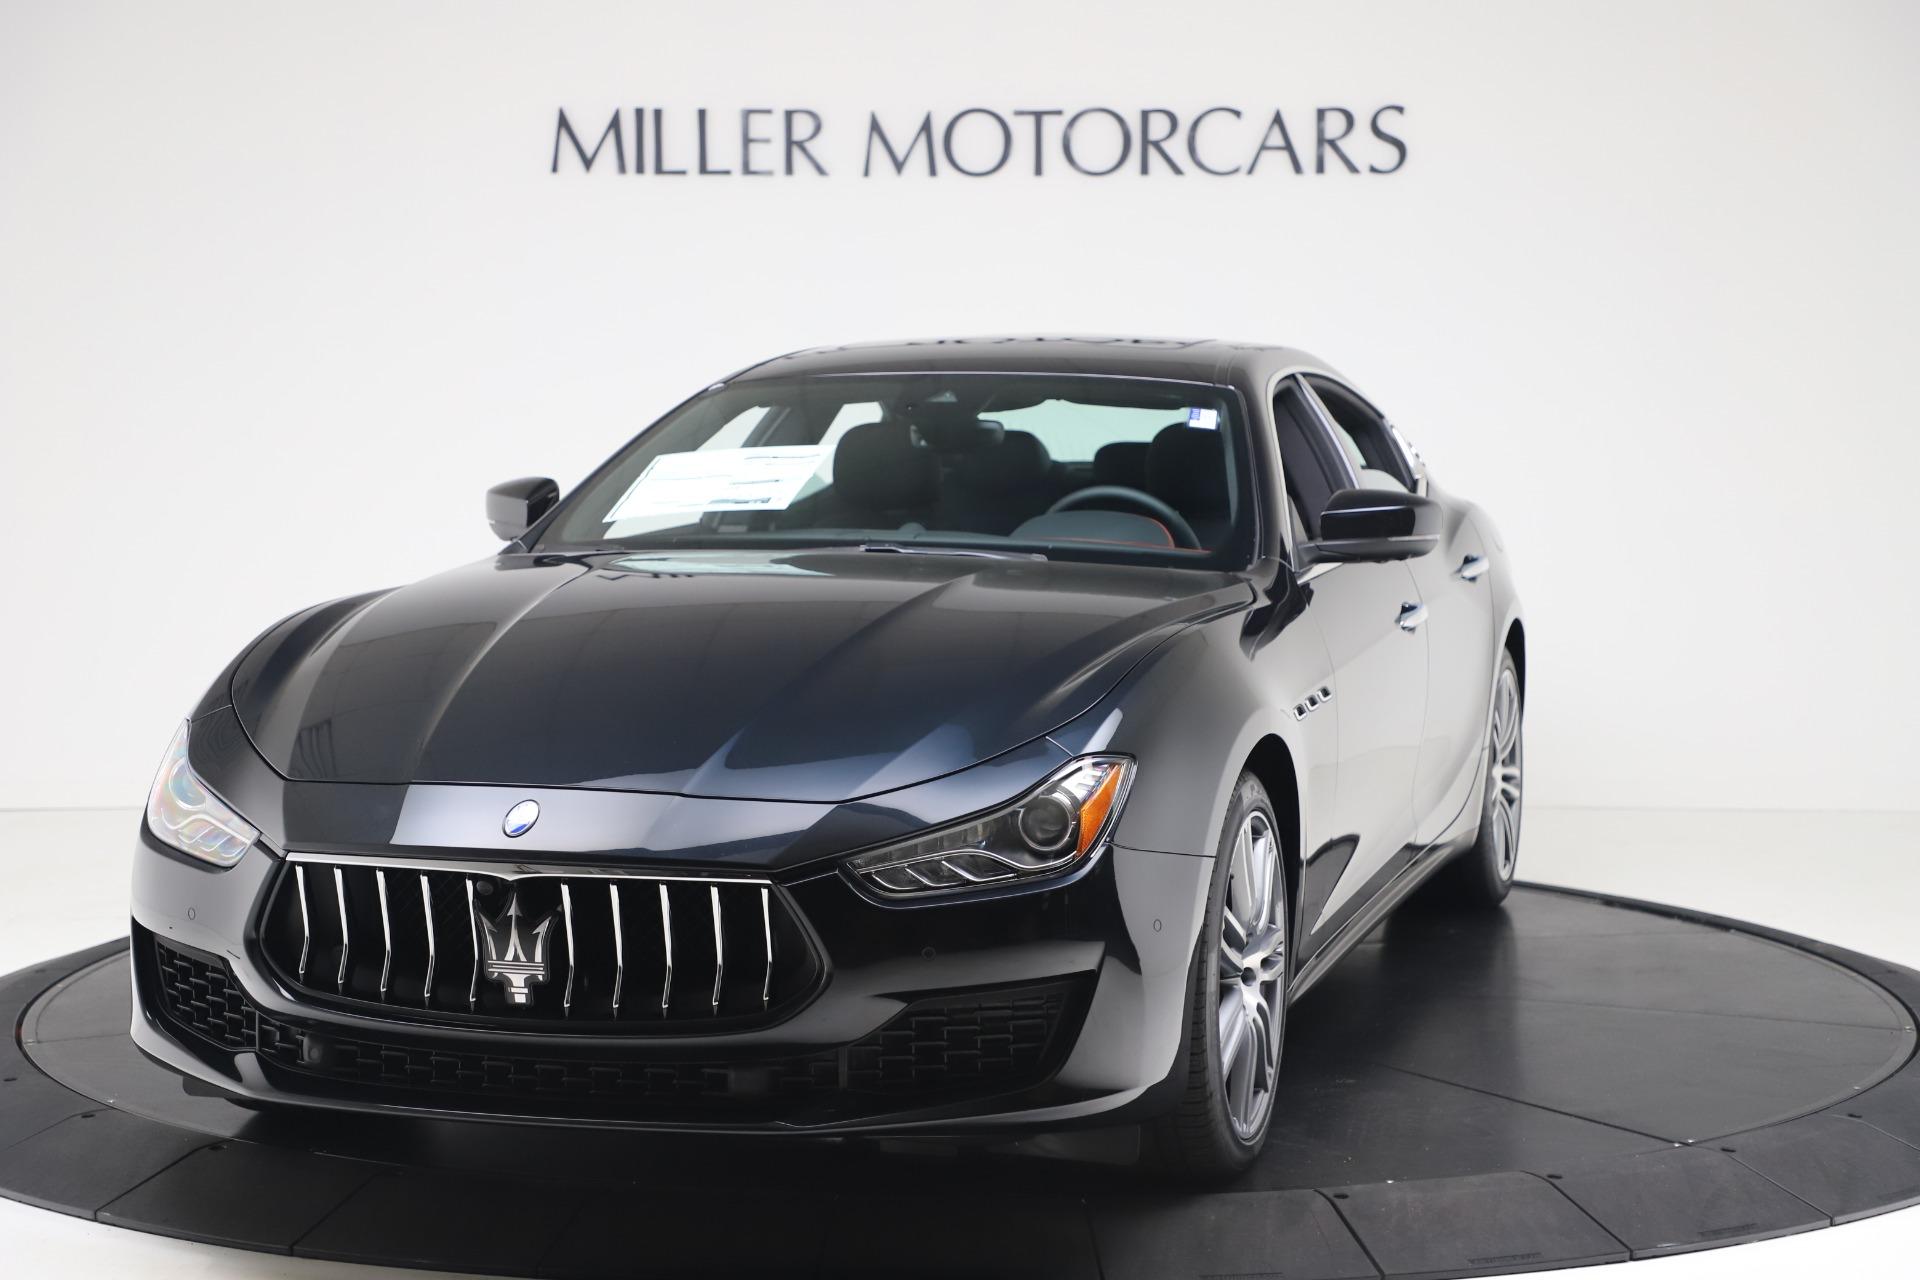 New 2020 Maserati Ghibli S Q4 for sale $87,285 at McLaren Greenwich in Greenwich CT 06830 1